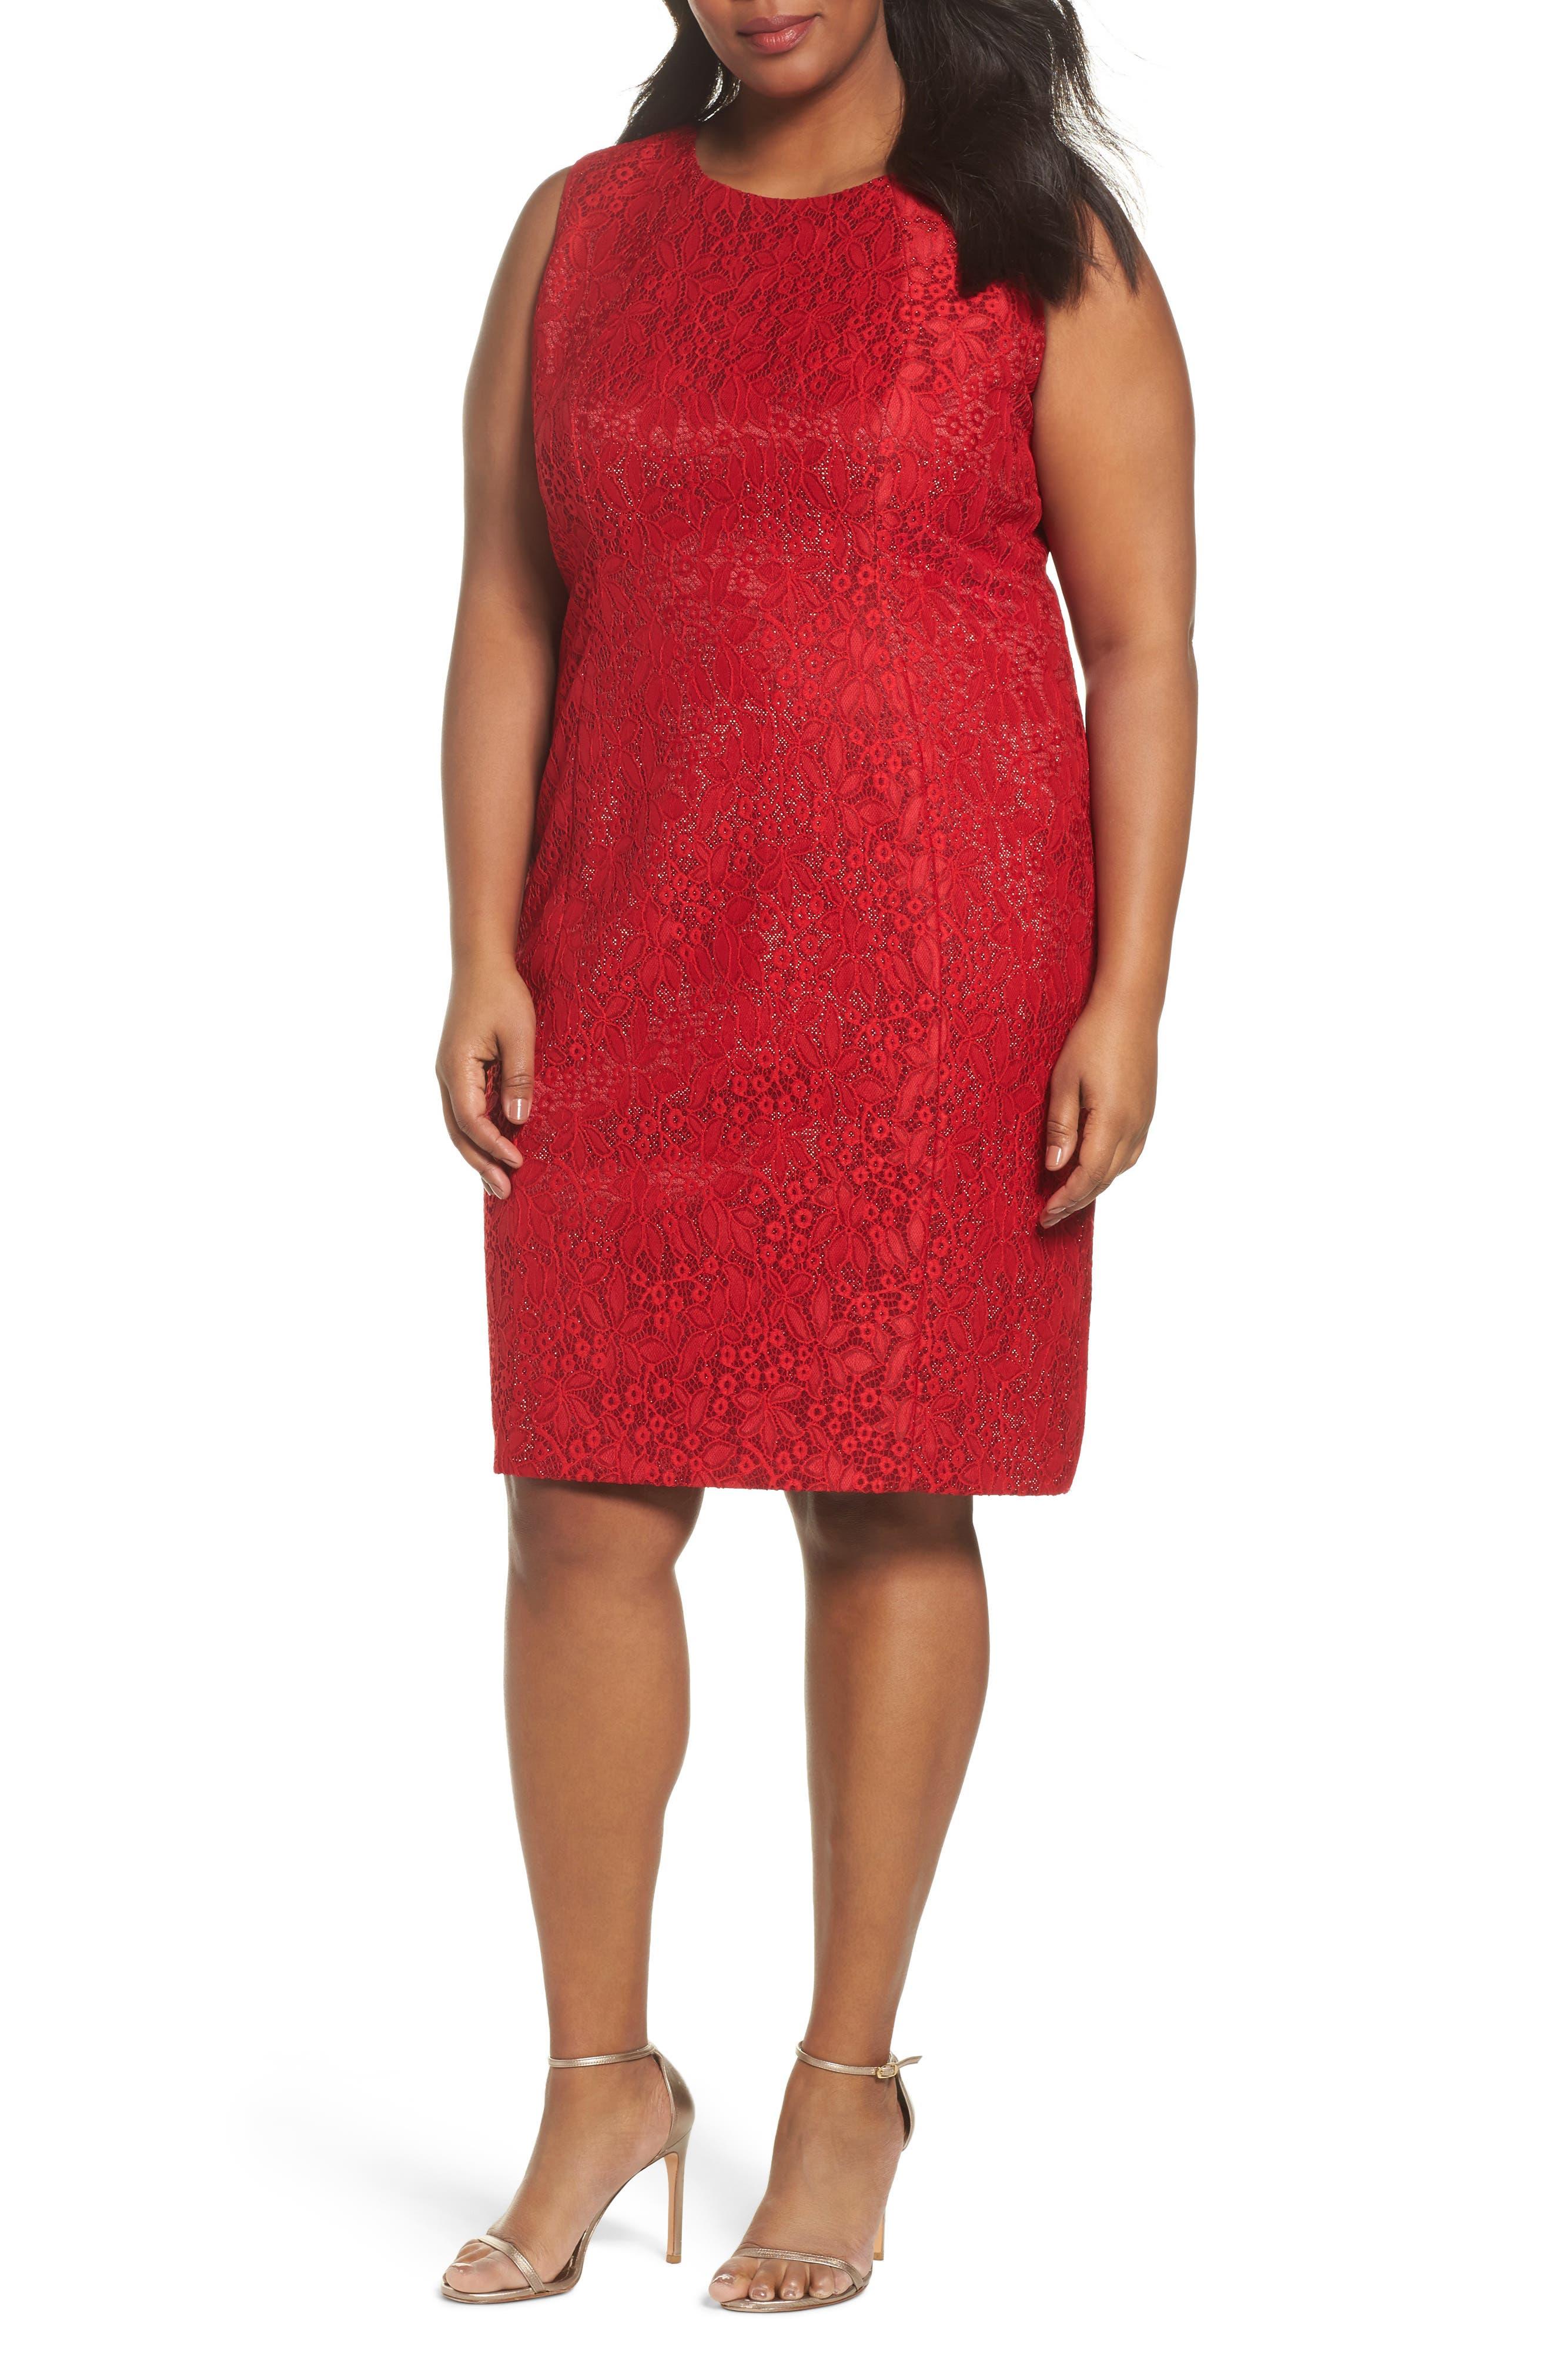 Alternate Image 1 Selected - Tahari Shimmer Lace Sheath Dress (Plus Size)